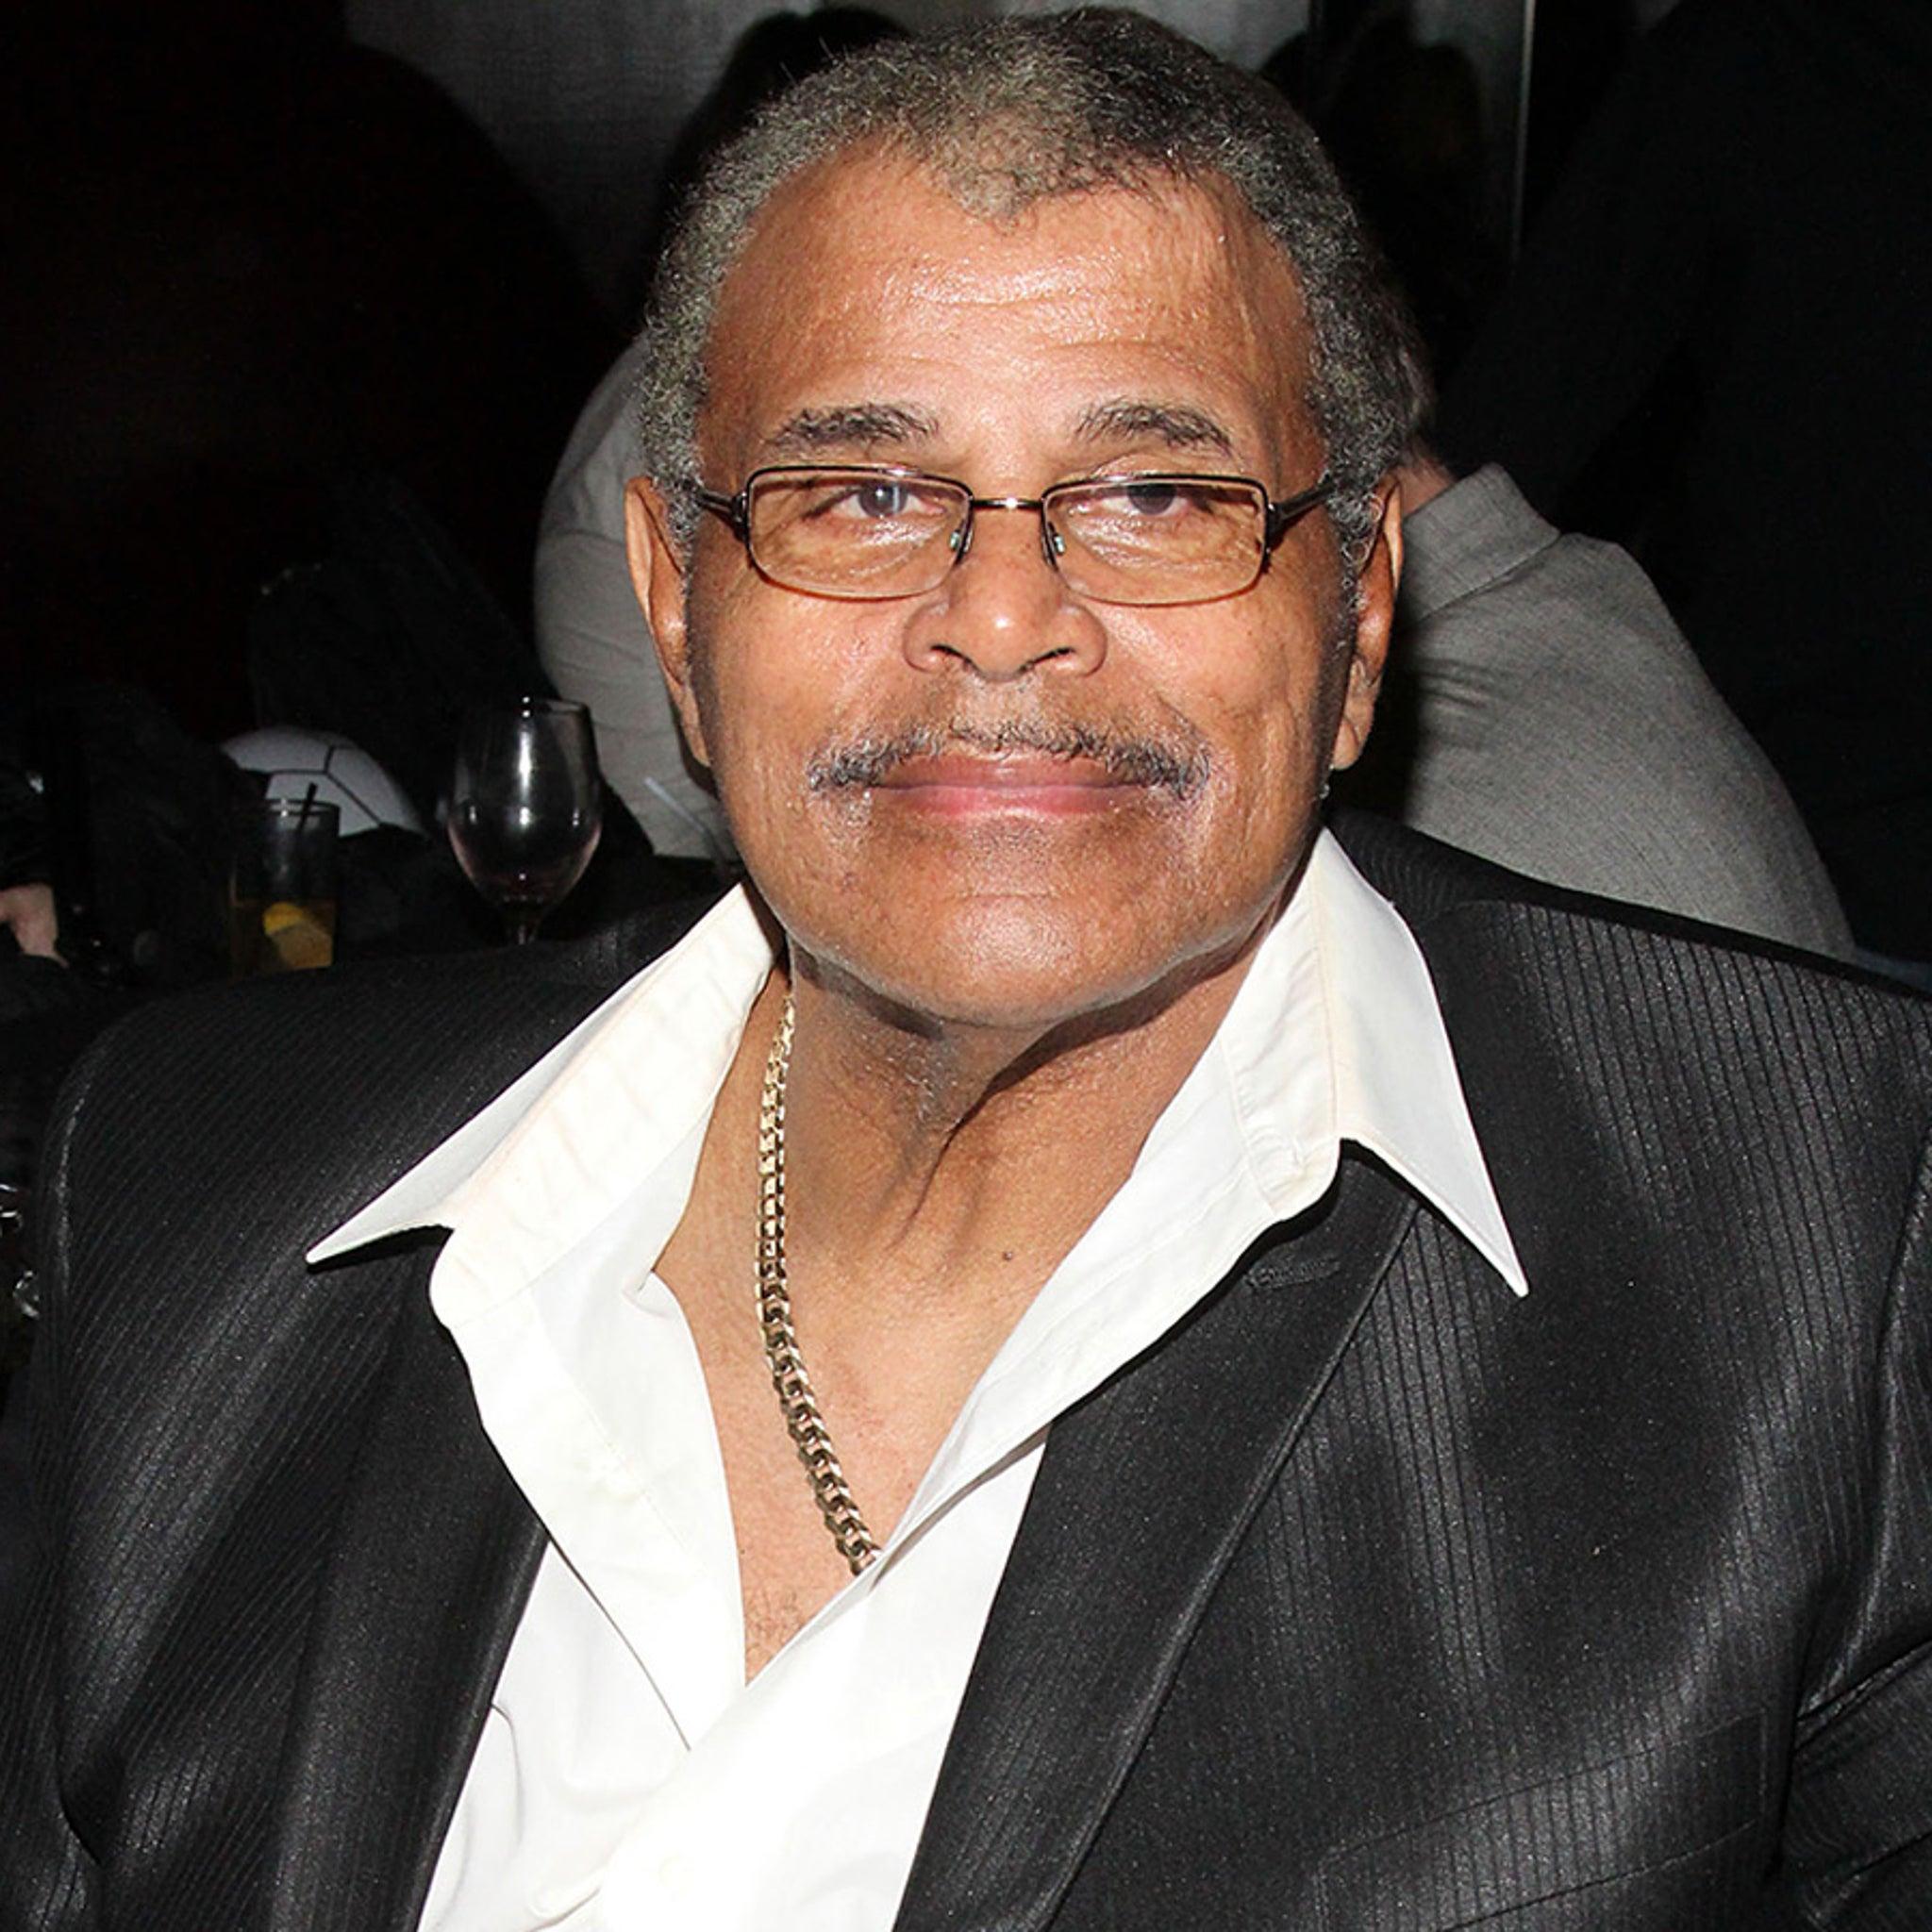 Dwayne Johnson's Dad, WWE Superstar Rocky 'Soul Man' Johnson Dead at 75